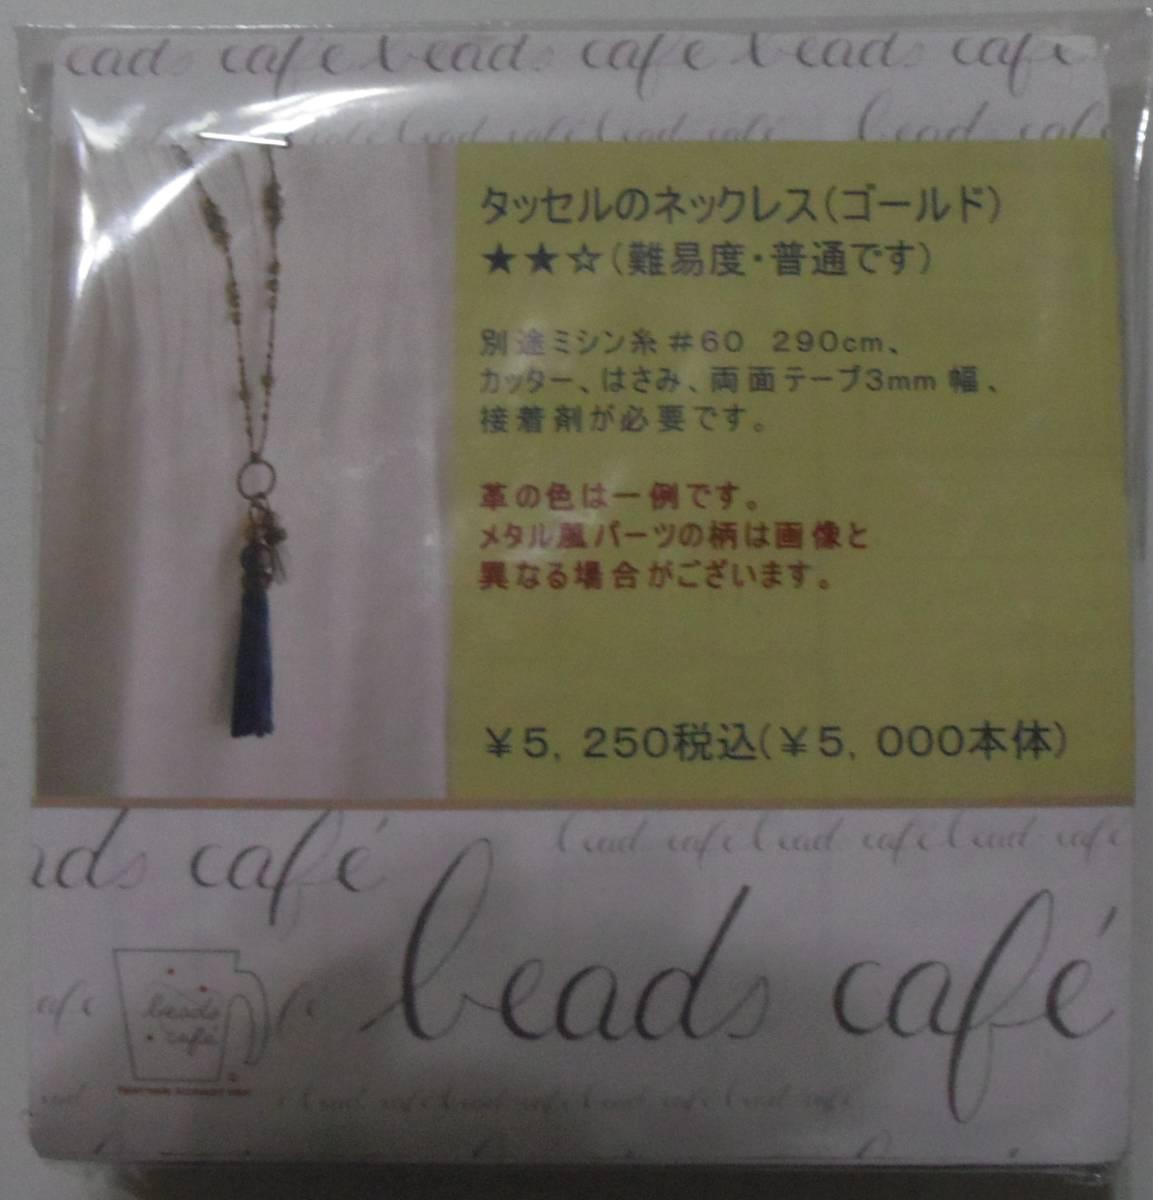 beads cafeのビーズキット タッセルのネックレス(ゴールド) 画像の転用・転載禁止ヤフオク様出品中noraandmax